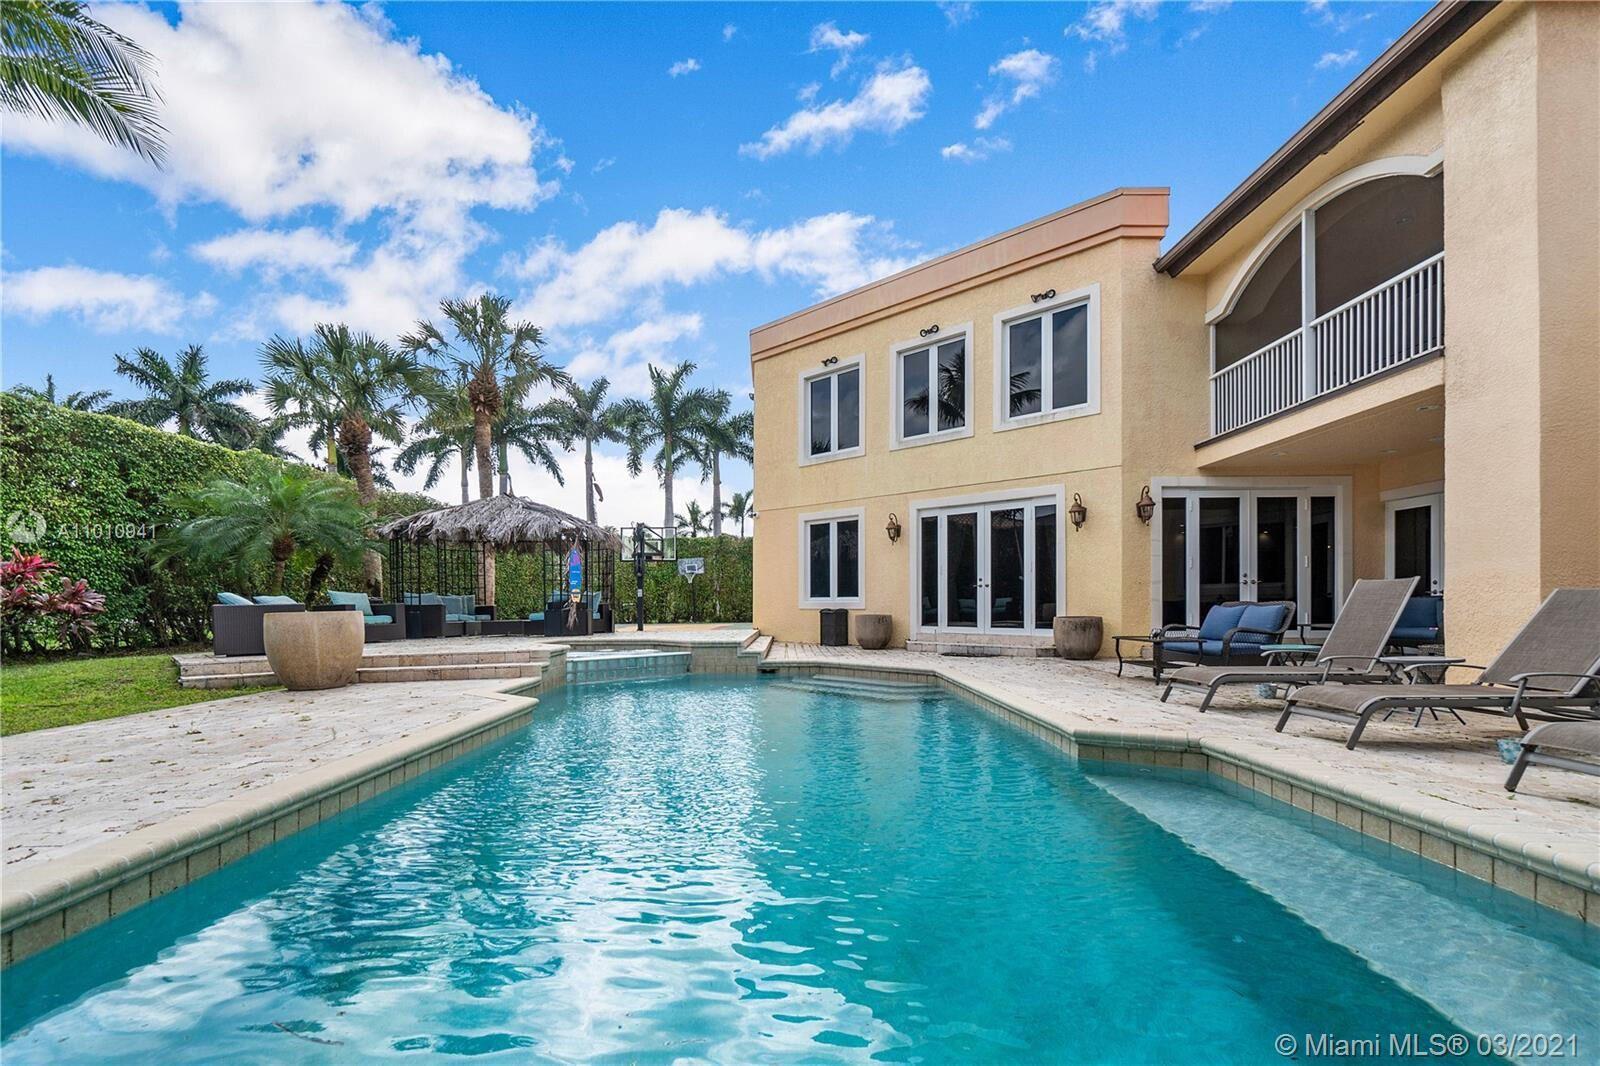 Photo of 3872 NW 53rd Street, Boca Raton, FL 33496 (MLS # RX-10753733)